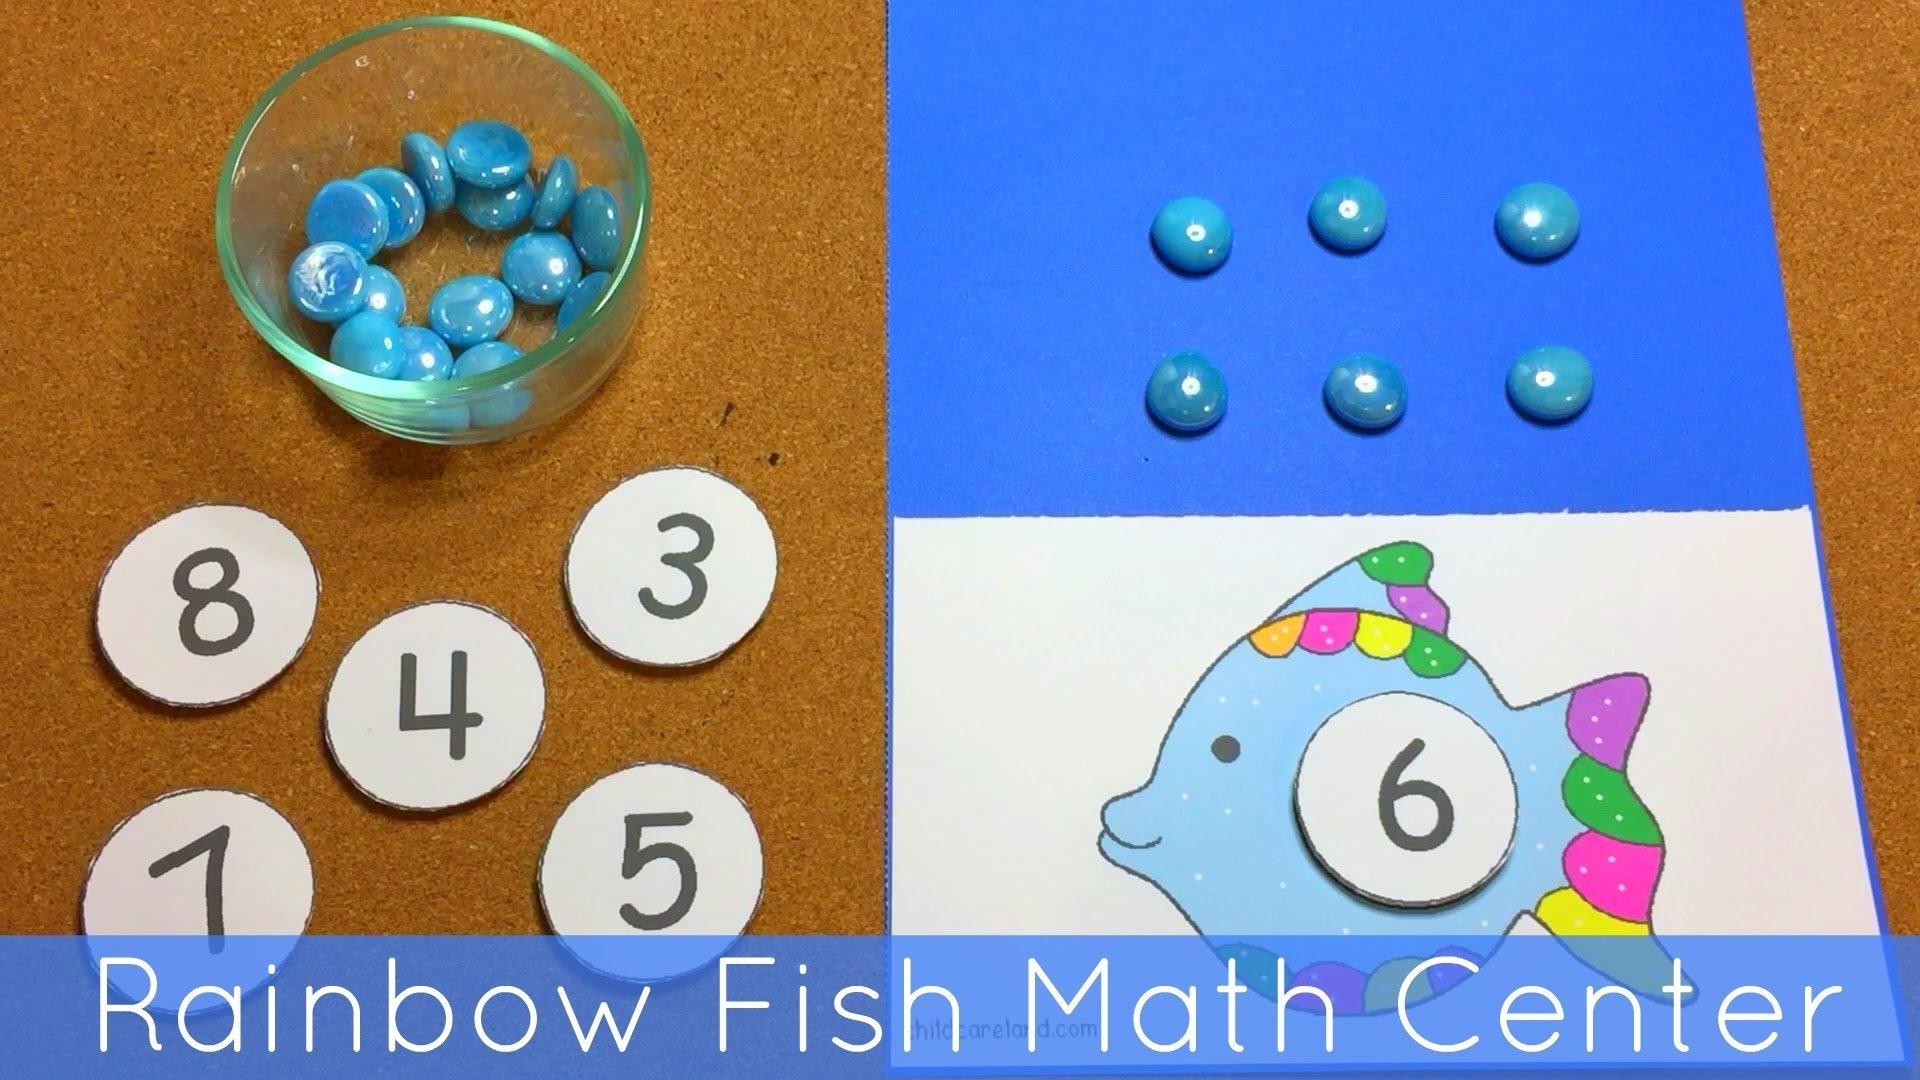 10 Attractive Math Center Ideas For Kindergarten rainbow fish math center for preschool and kindergarten youtube 2021